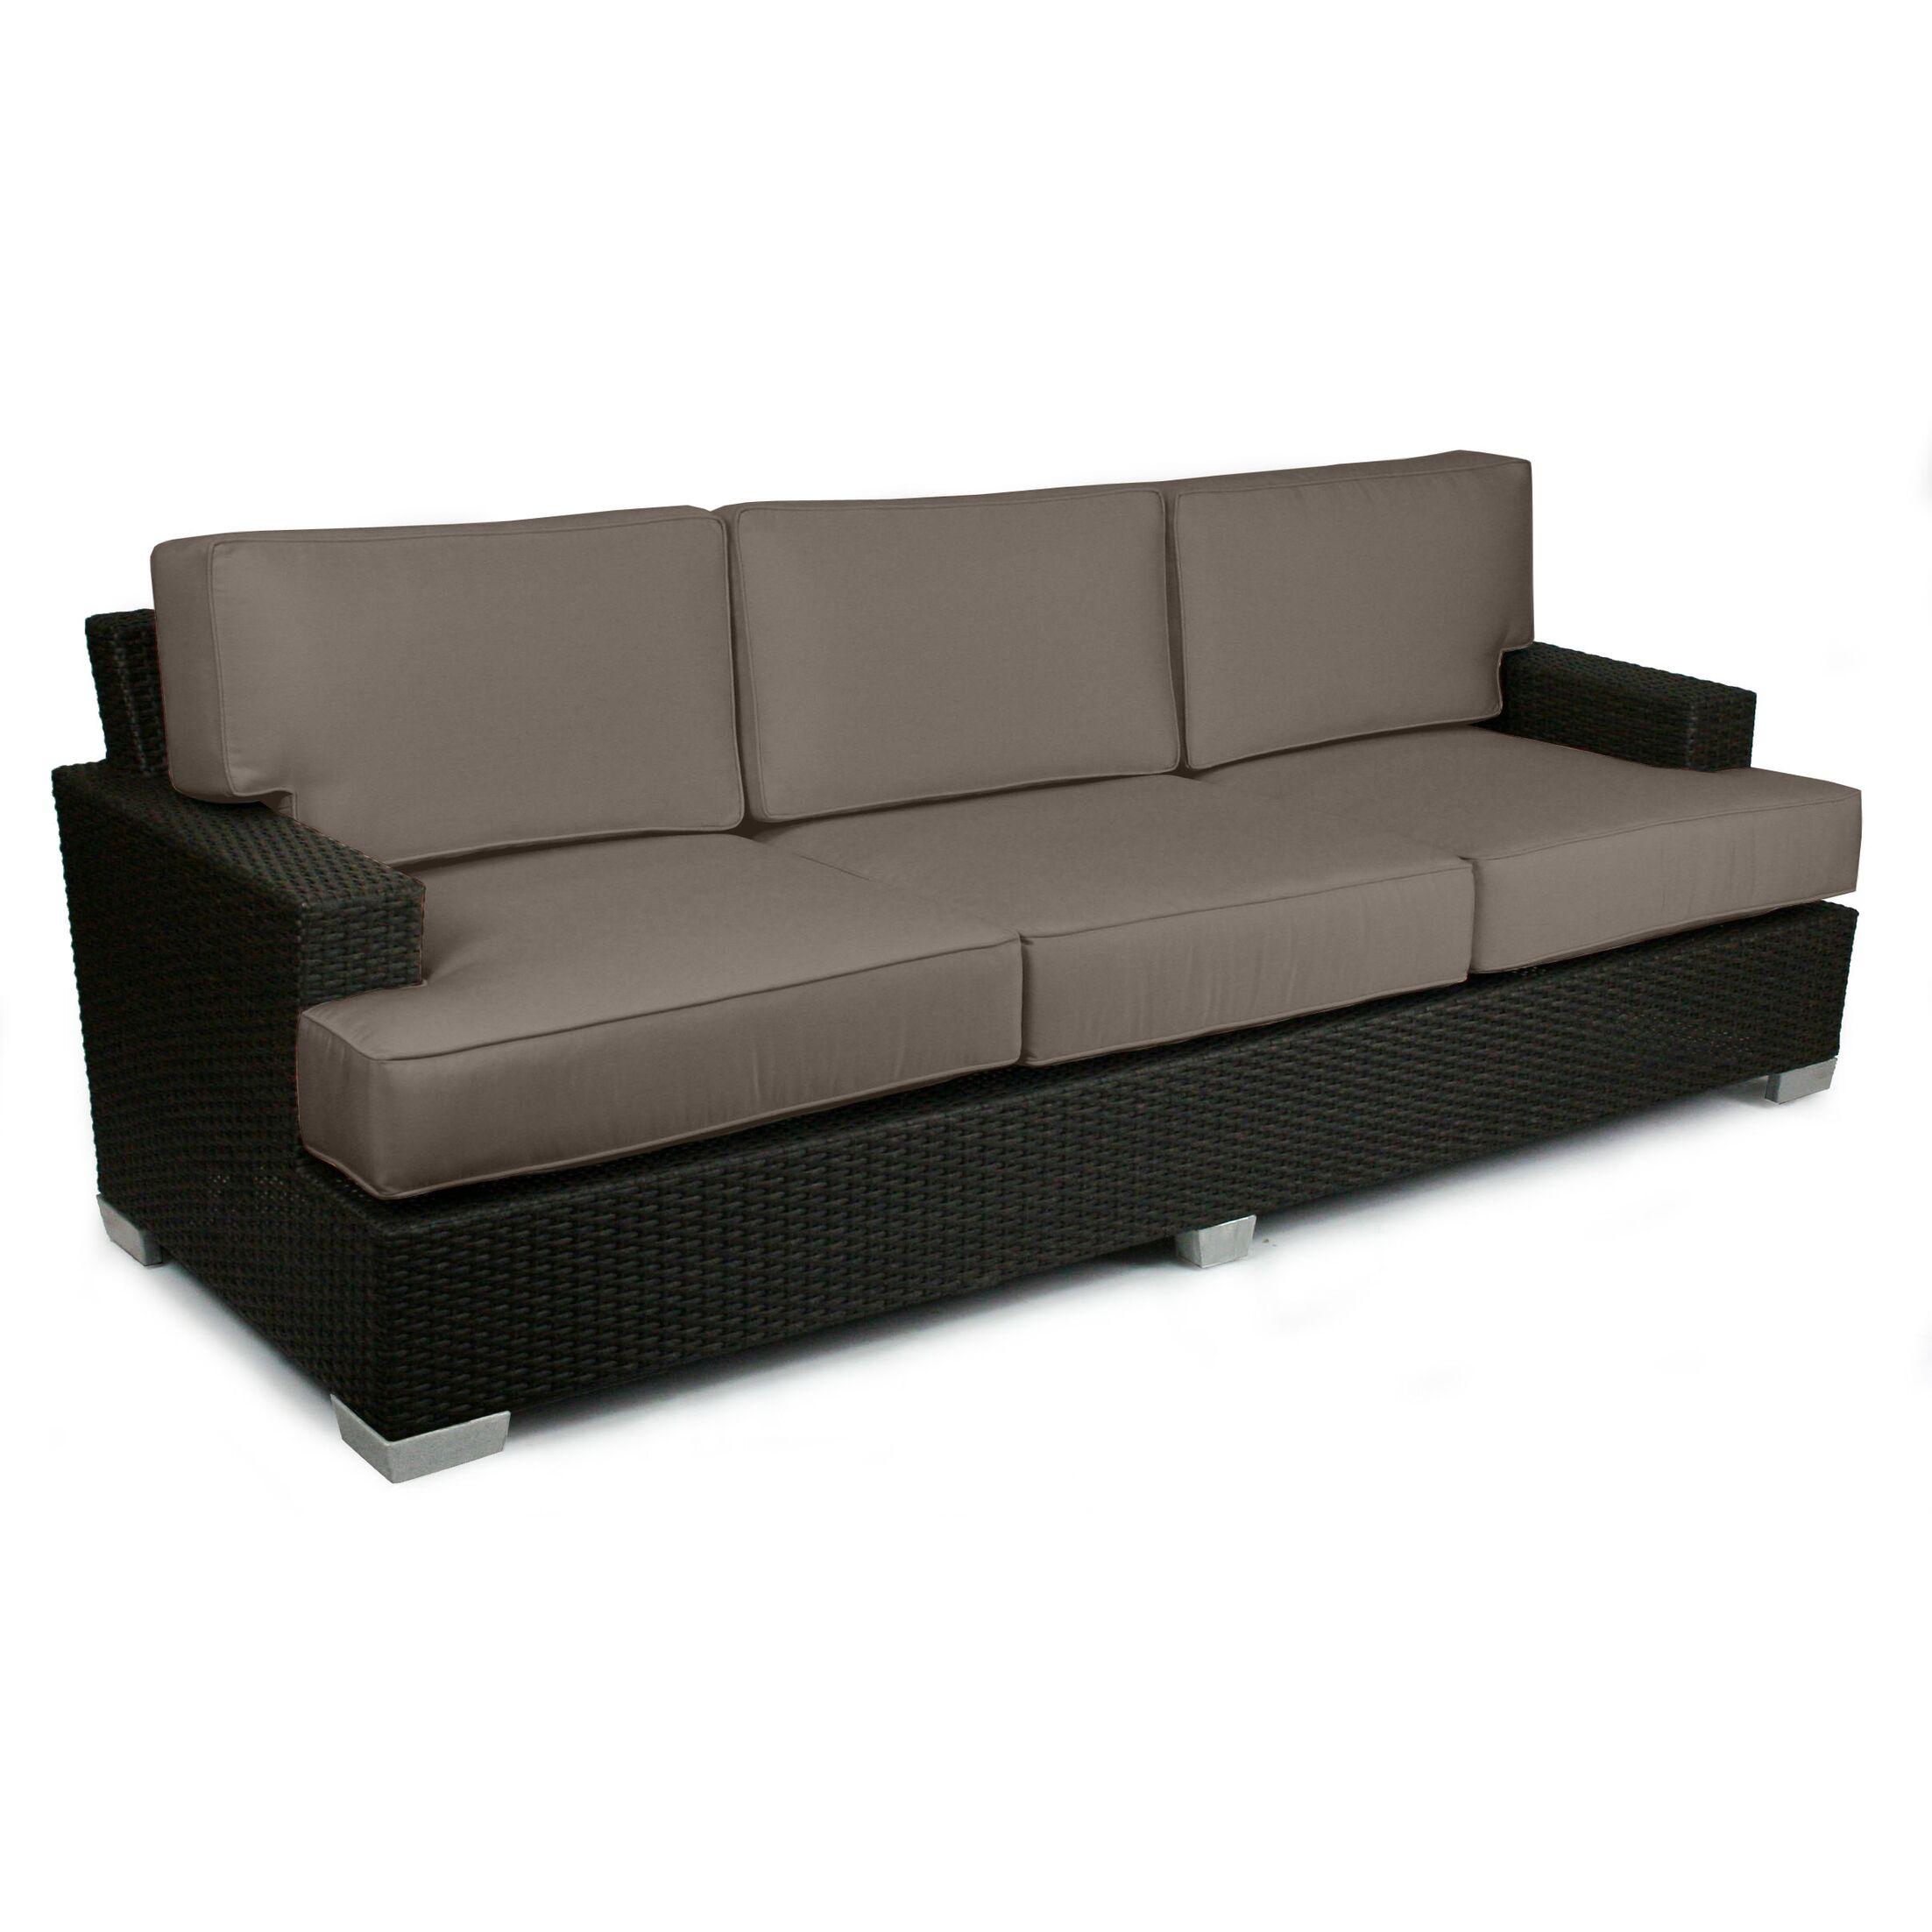 Signature Sofa with Cushions Fabric: Coffee